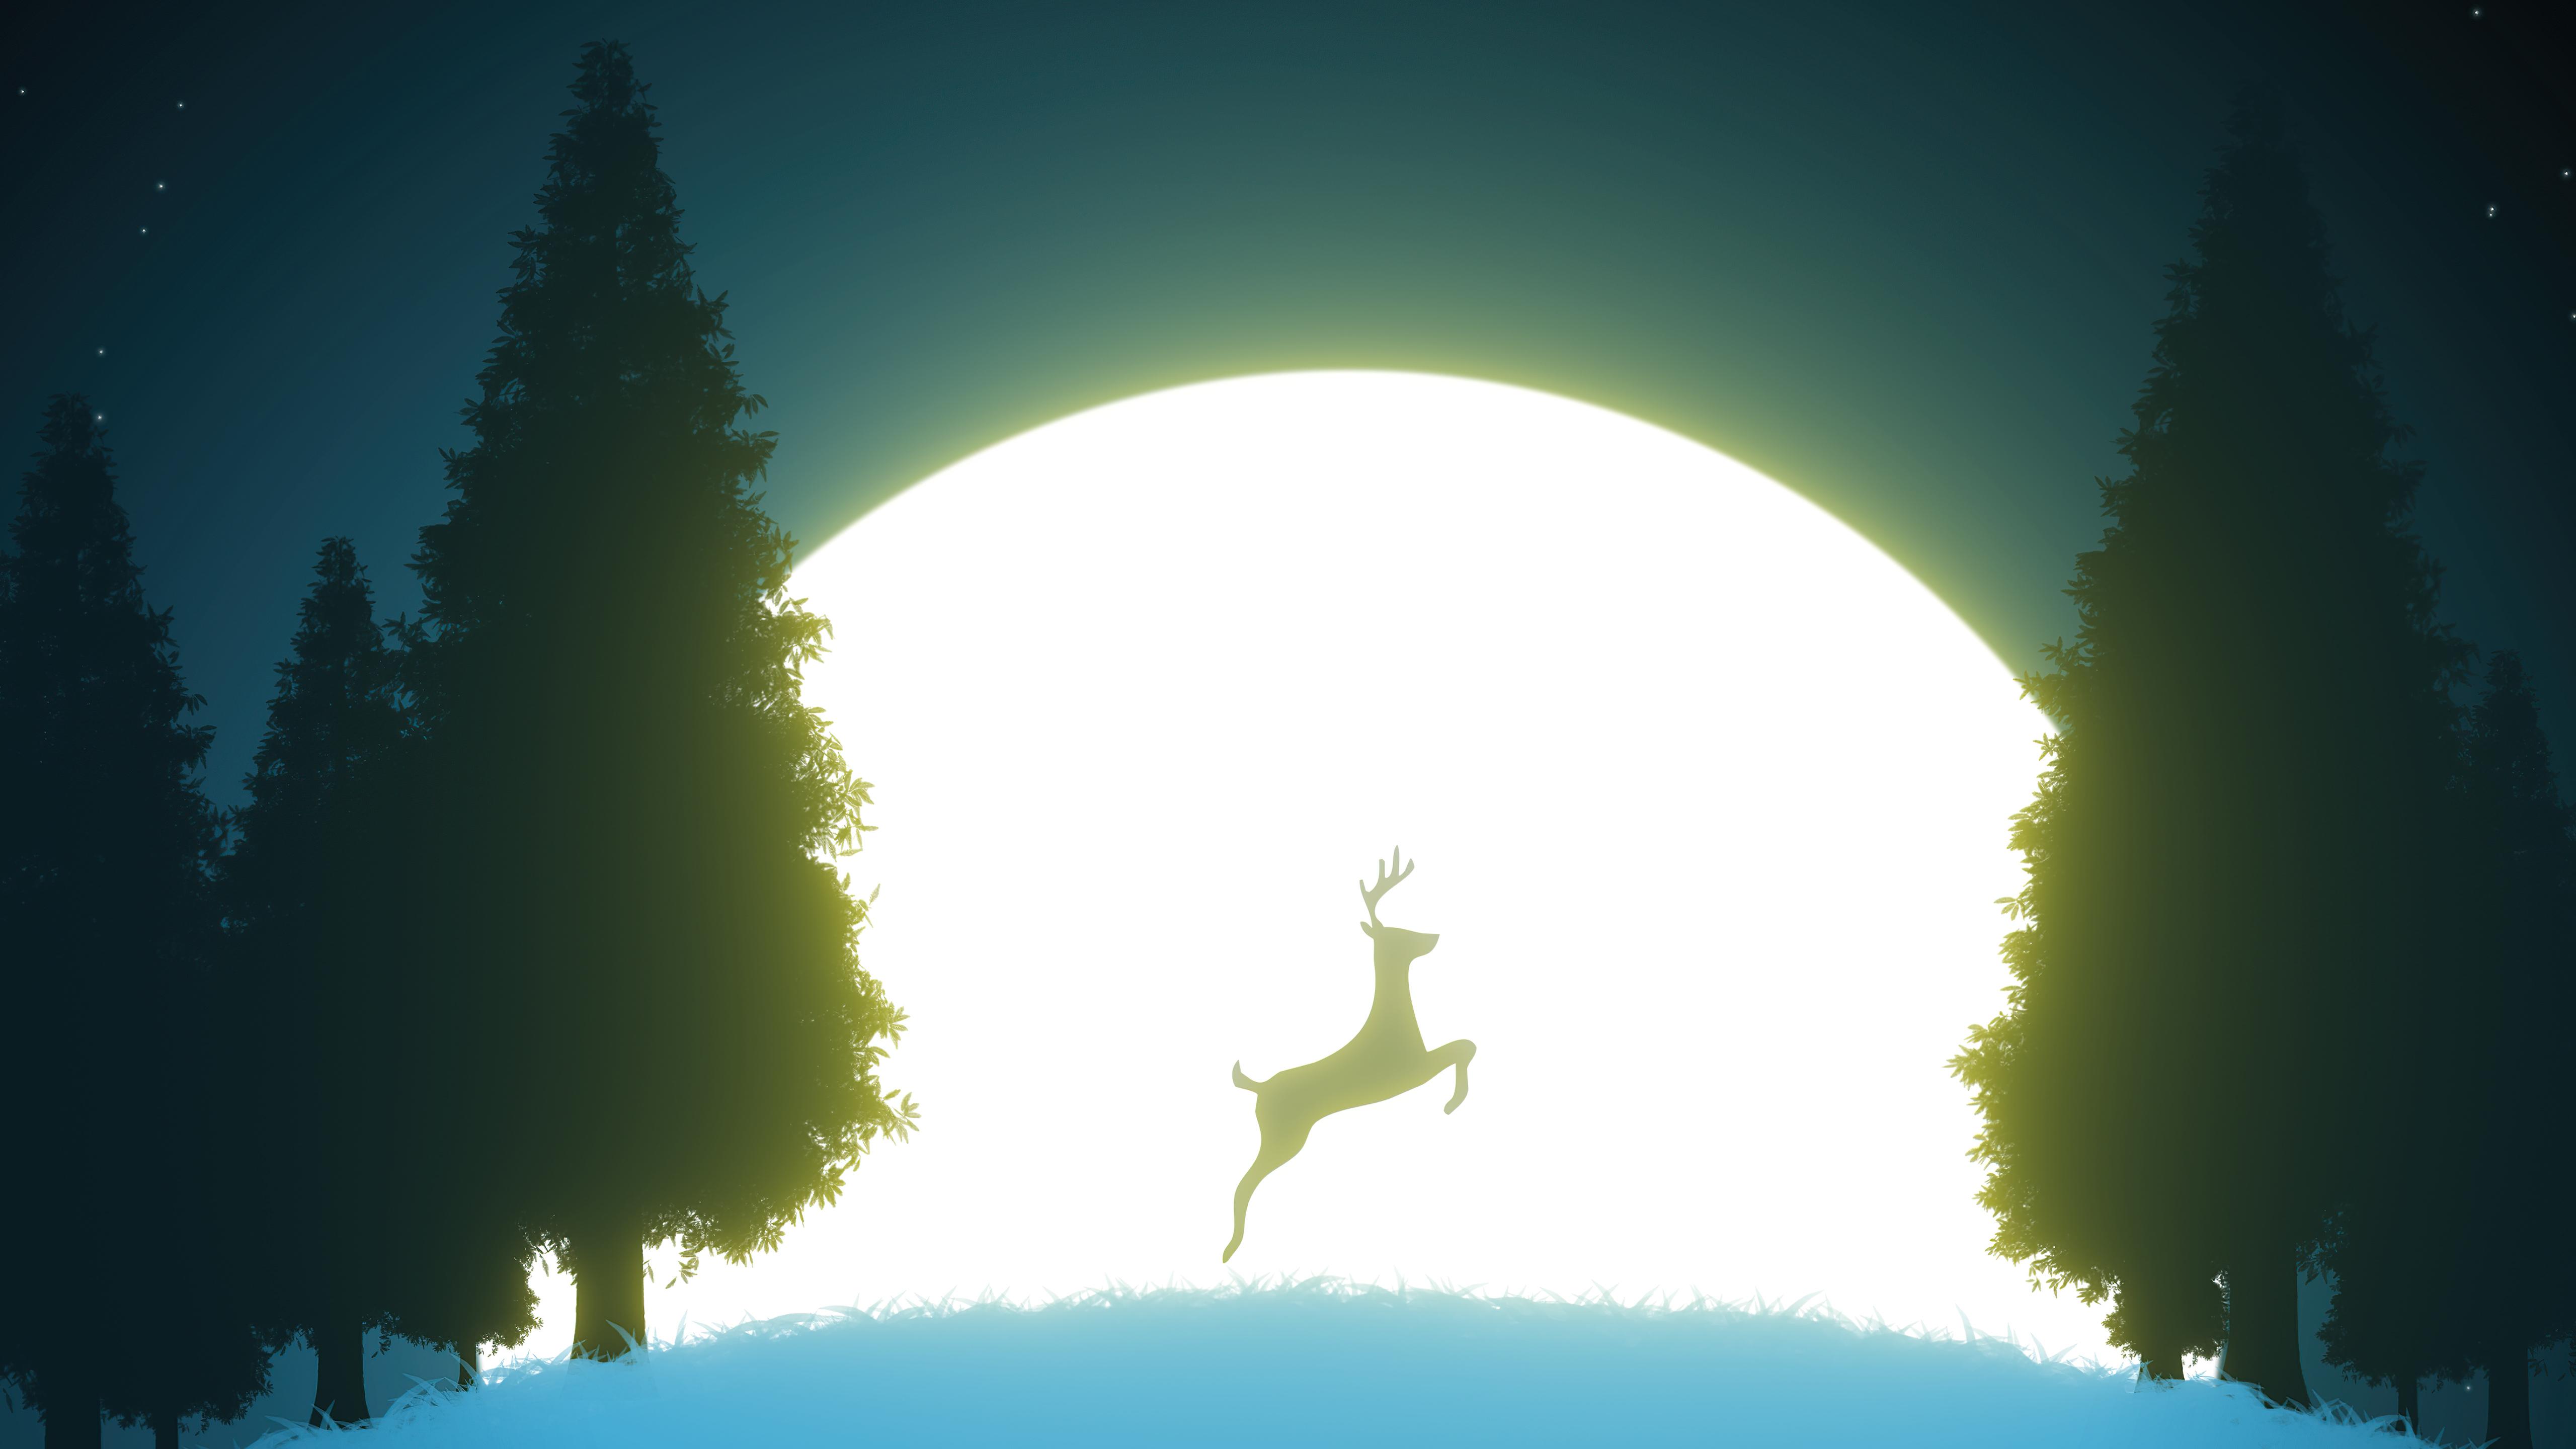 reindeer night jump 4k 1618129012 - Reindeer Night Jump 4k - Reindeer Night Jump 4k wallpapers